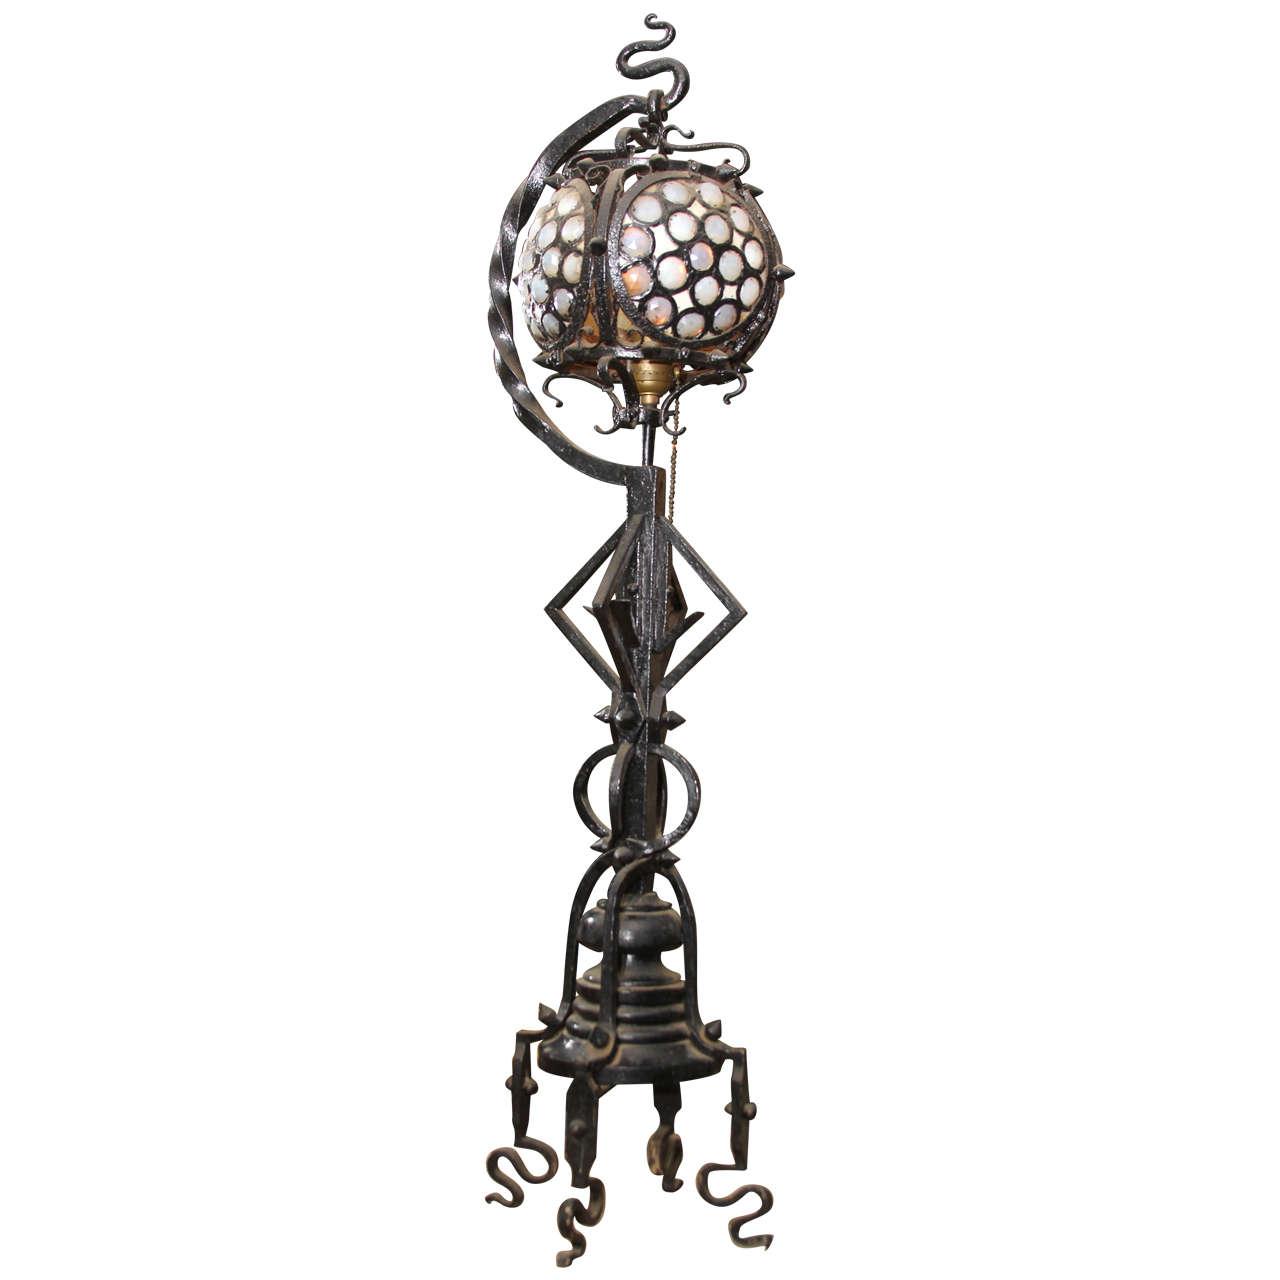 Hand wrought arts and craft table lamp at 1stdibs hand wrought arts craft table lamp for sale aloadofball Choice Image